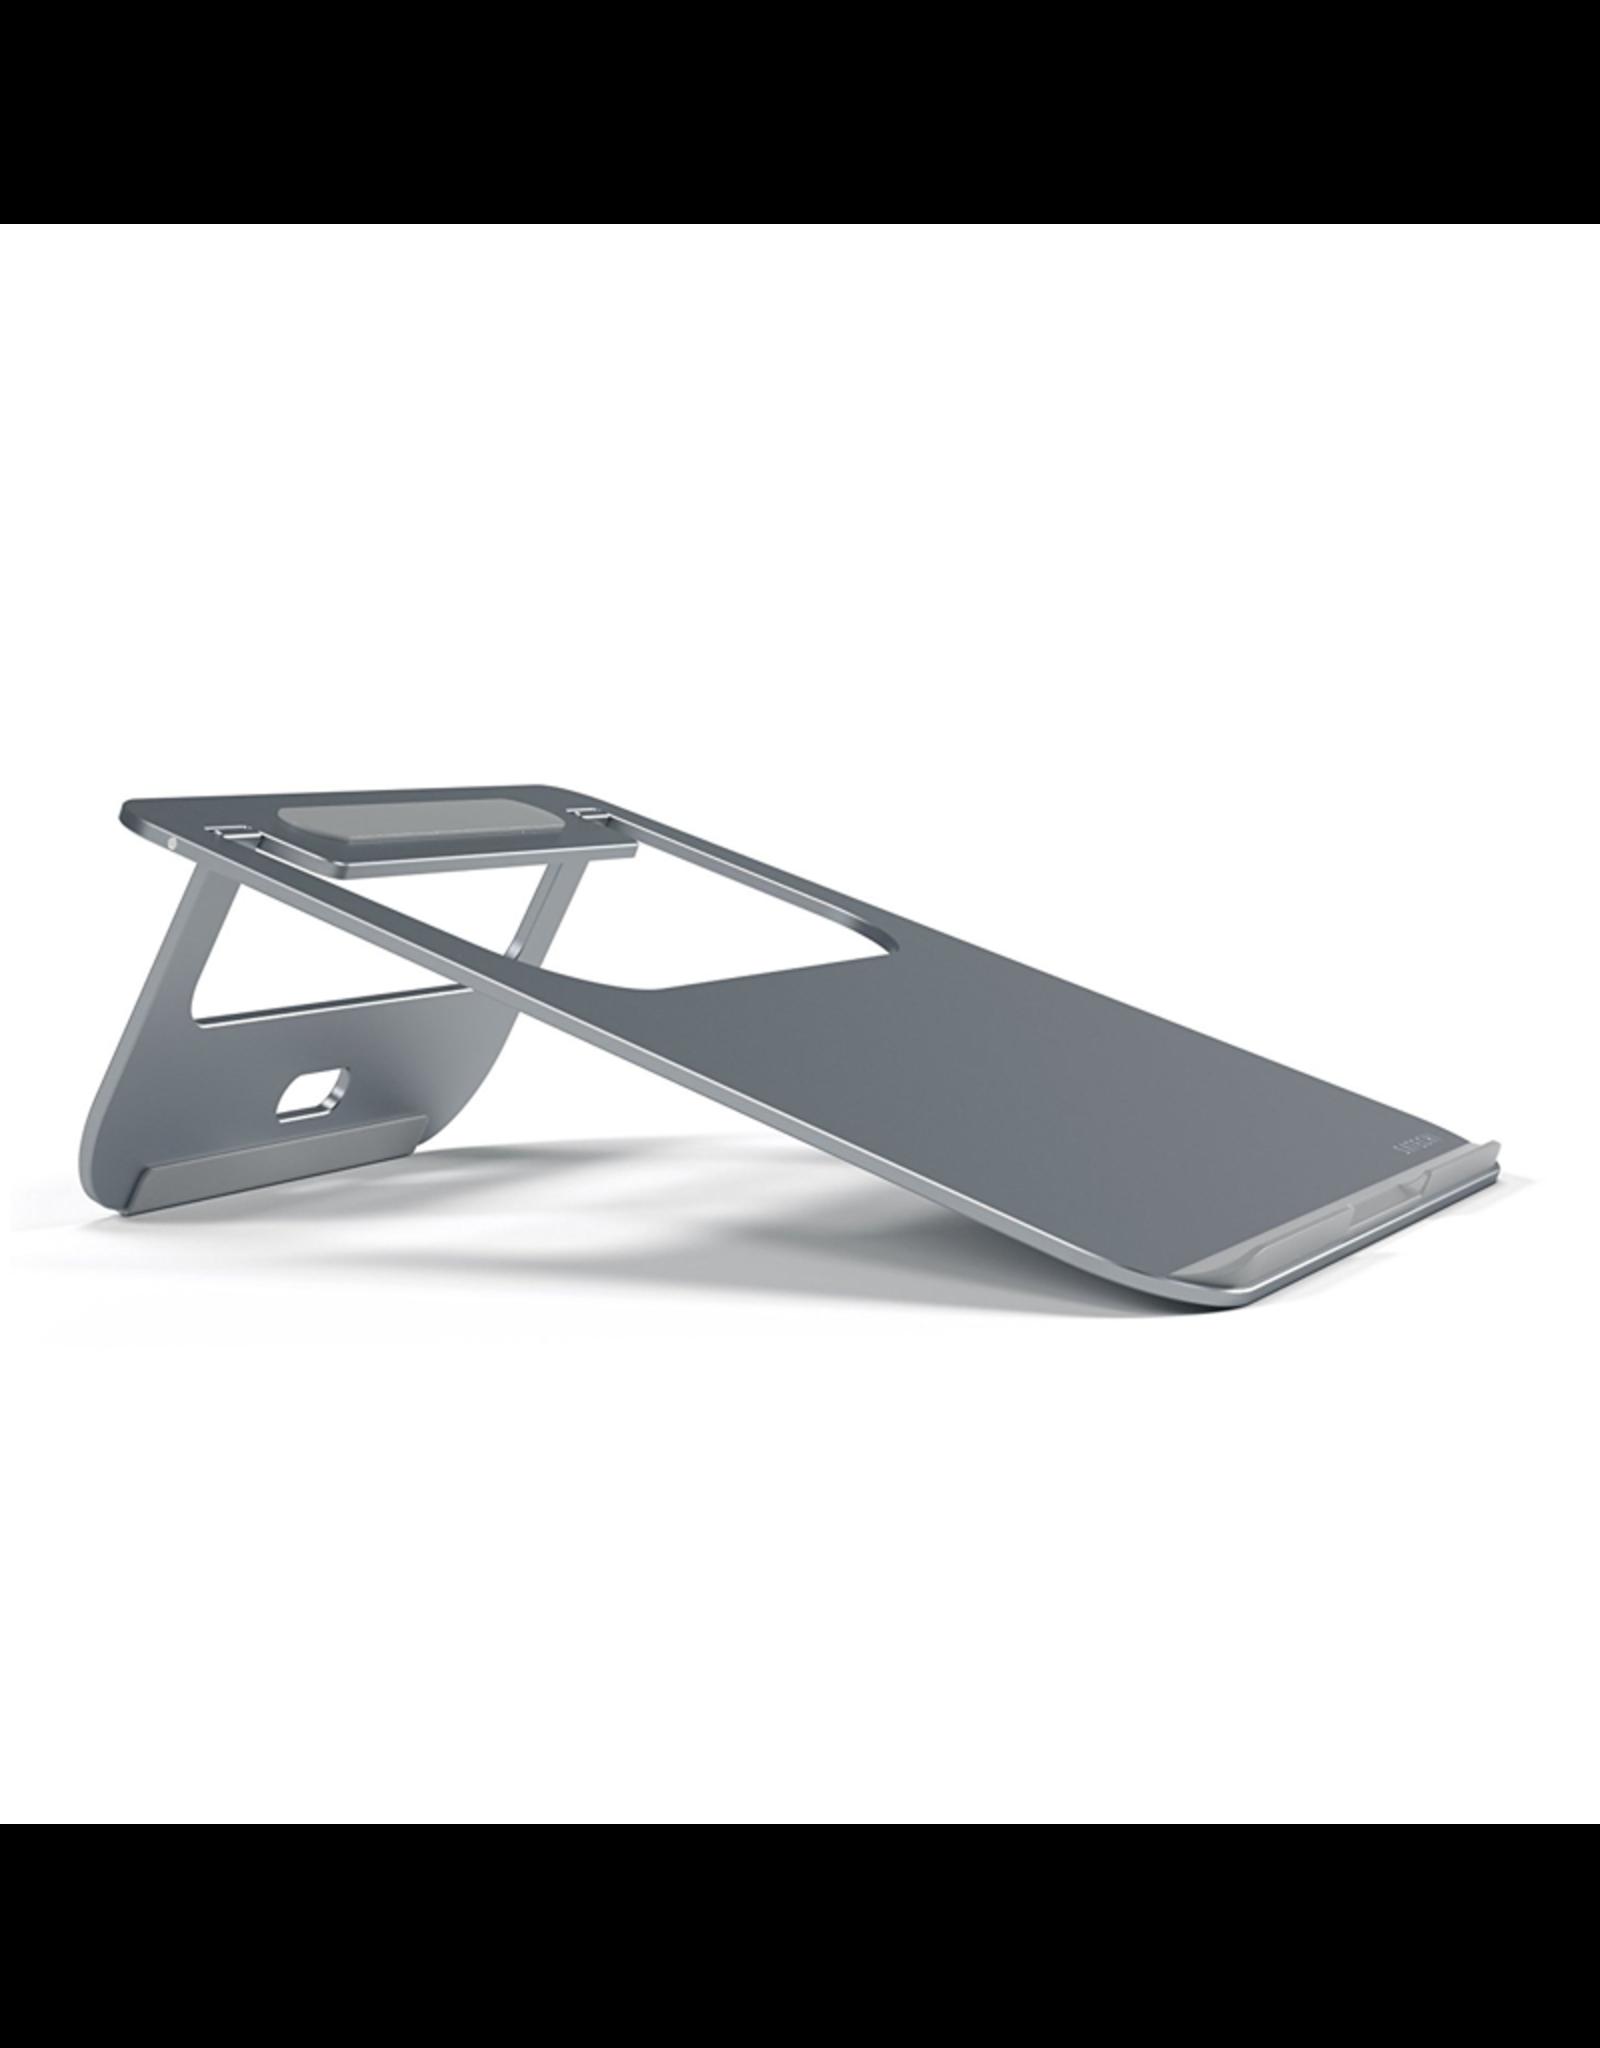 Satechi Satechi Aluminum Laptop Stand Silver